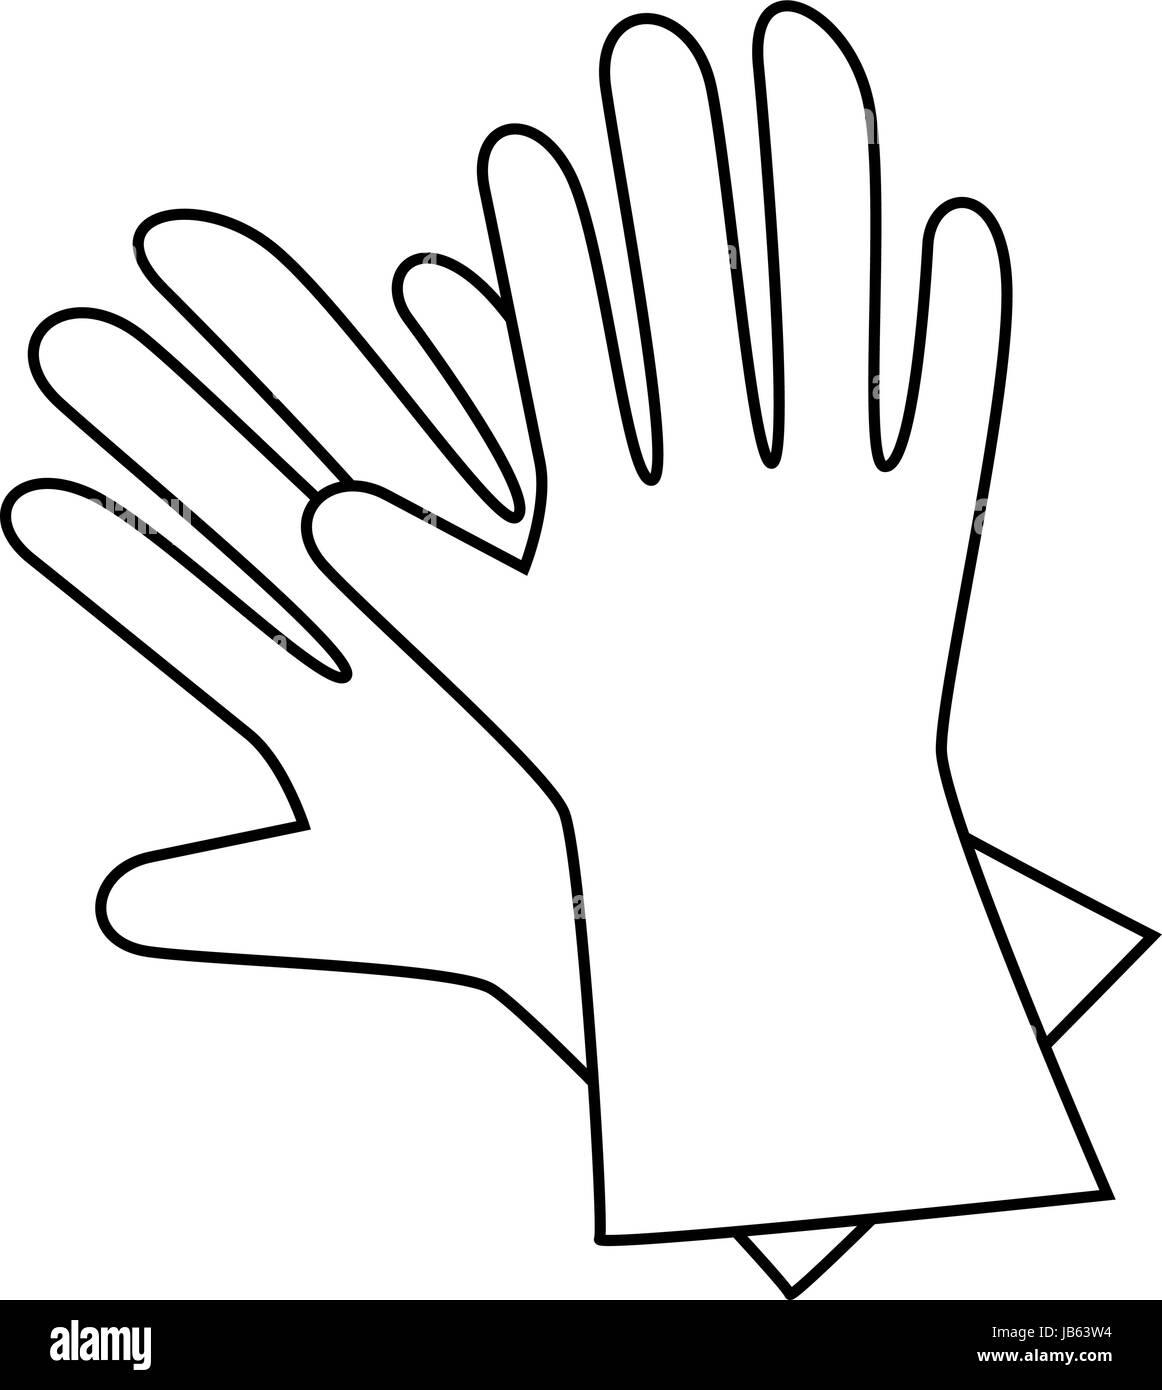 gardening gloves icon Stock Vector Art \u0026 Illustration